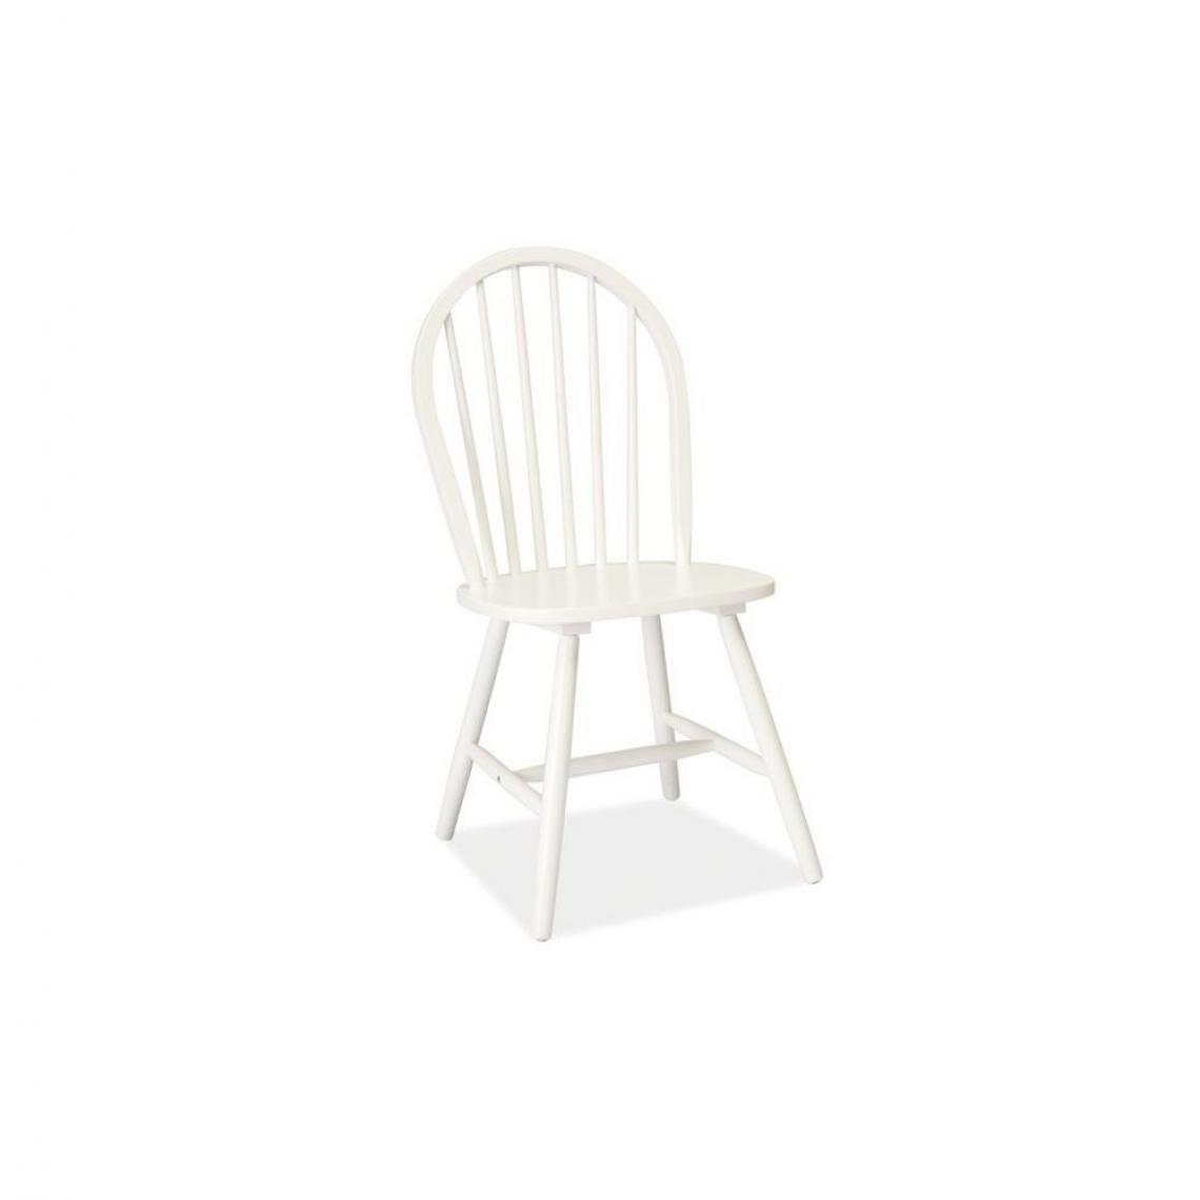 Ac-Deco Chaise - Fiero - 45 x 39 x 95 cm - Bois - Blanc